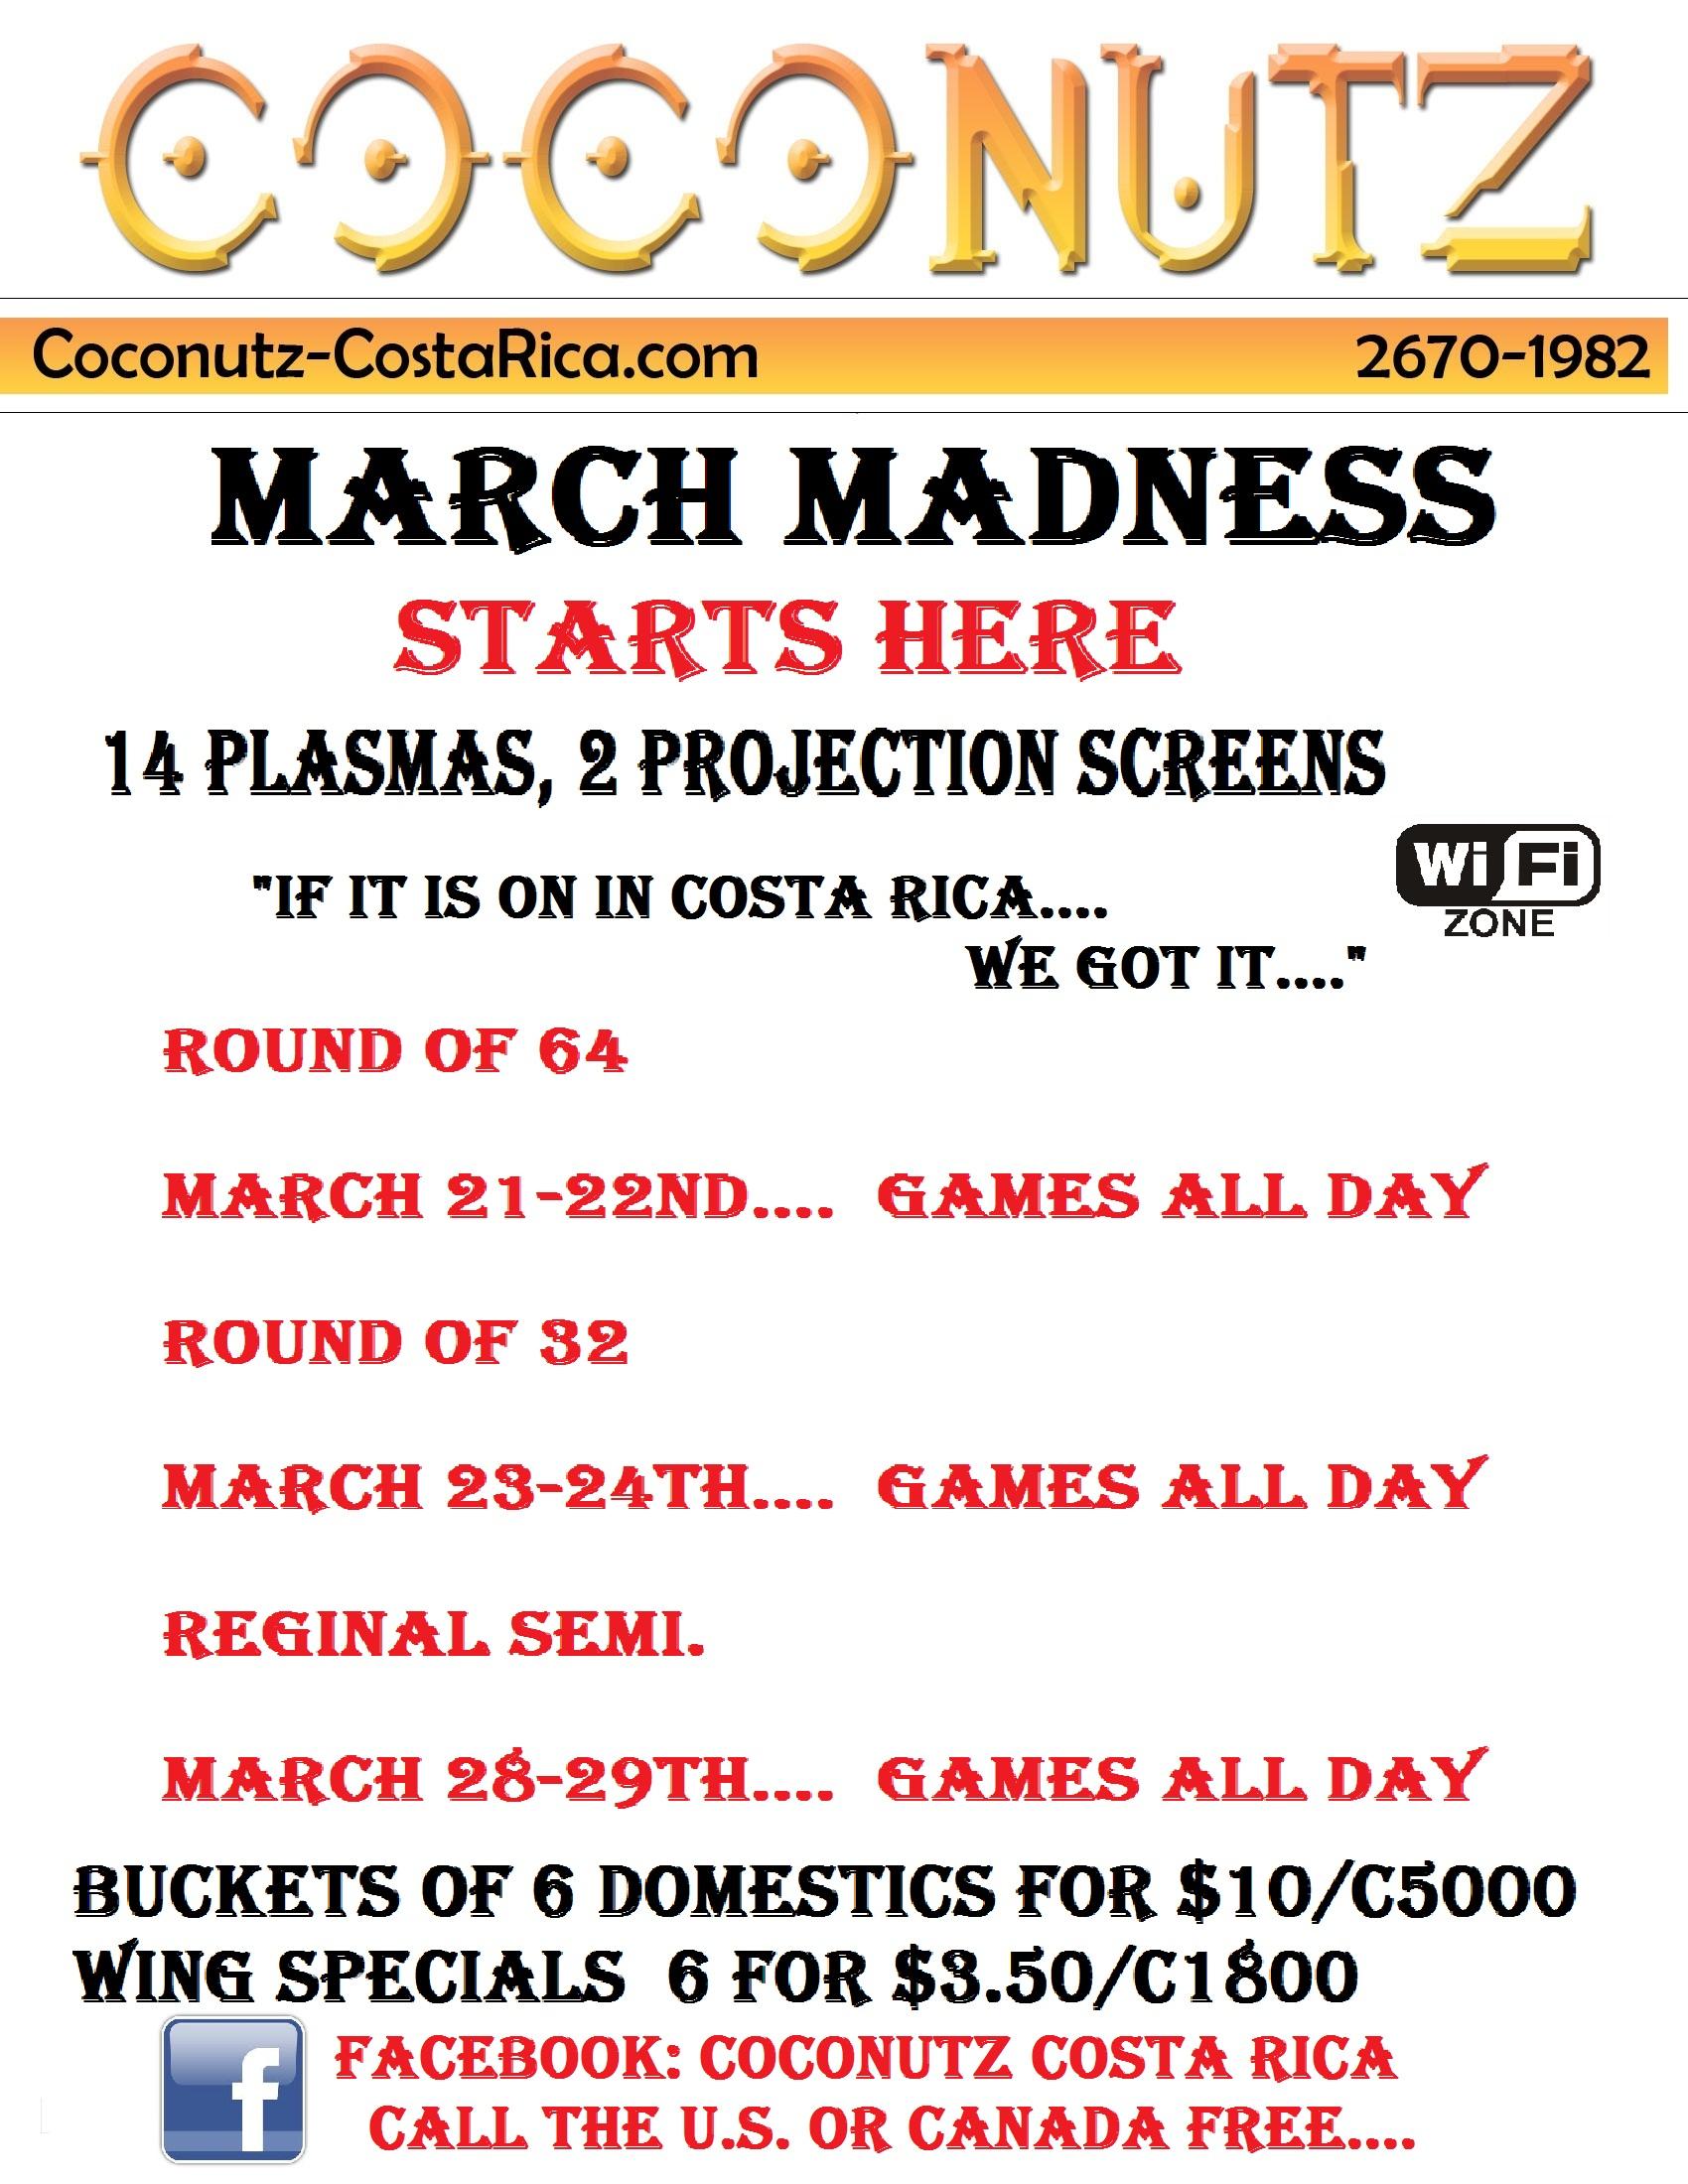 March Madness Games at Coconutz Costa Rica